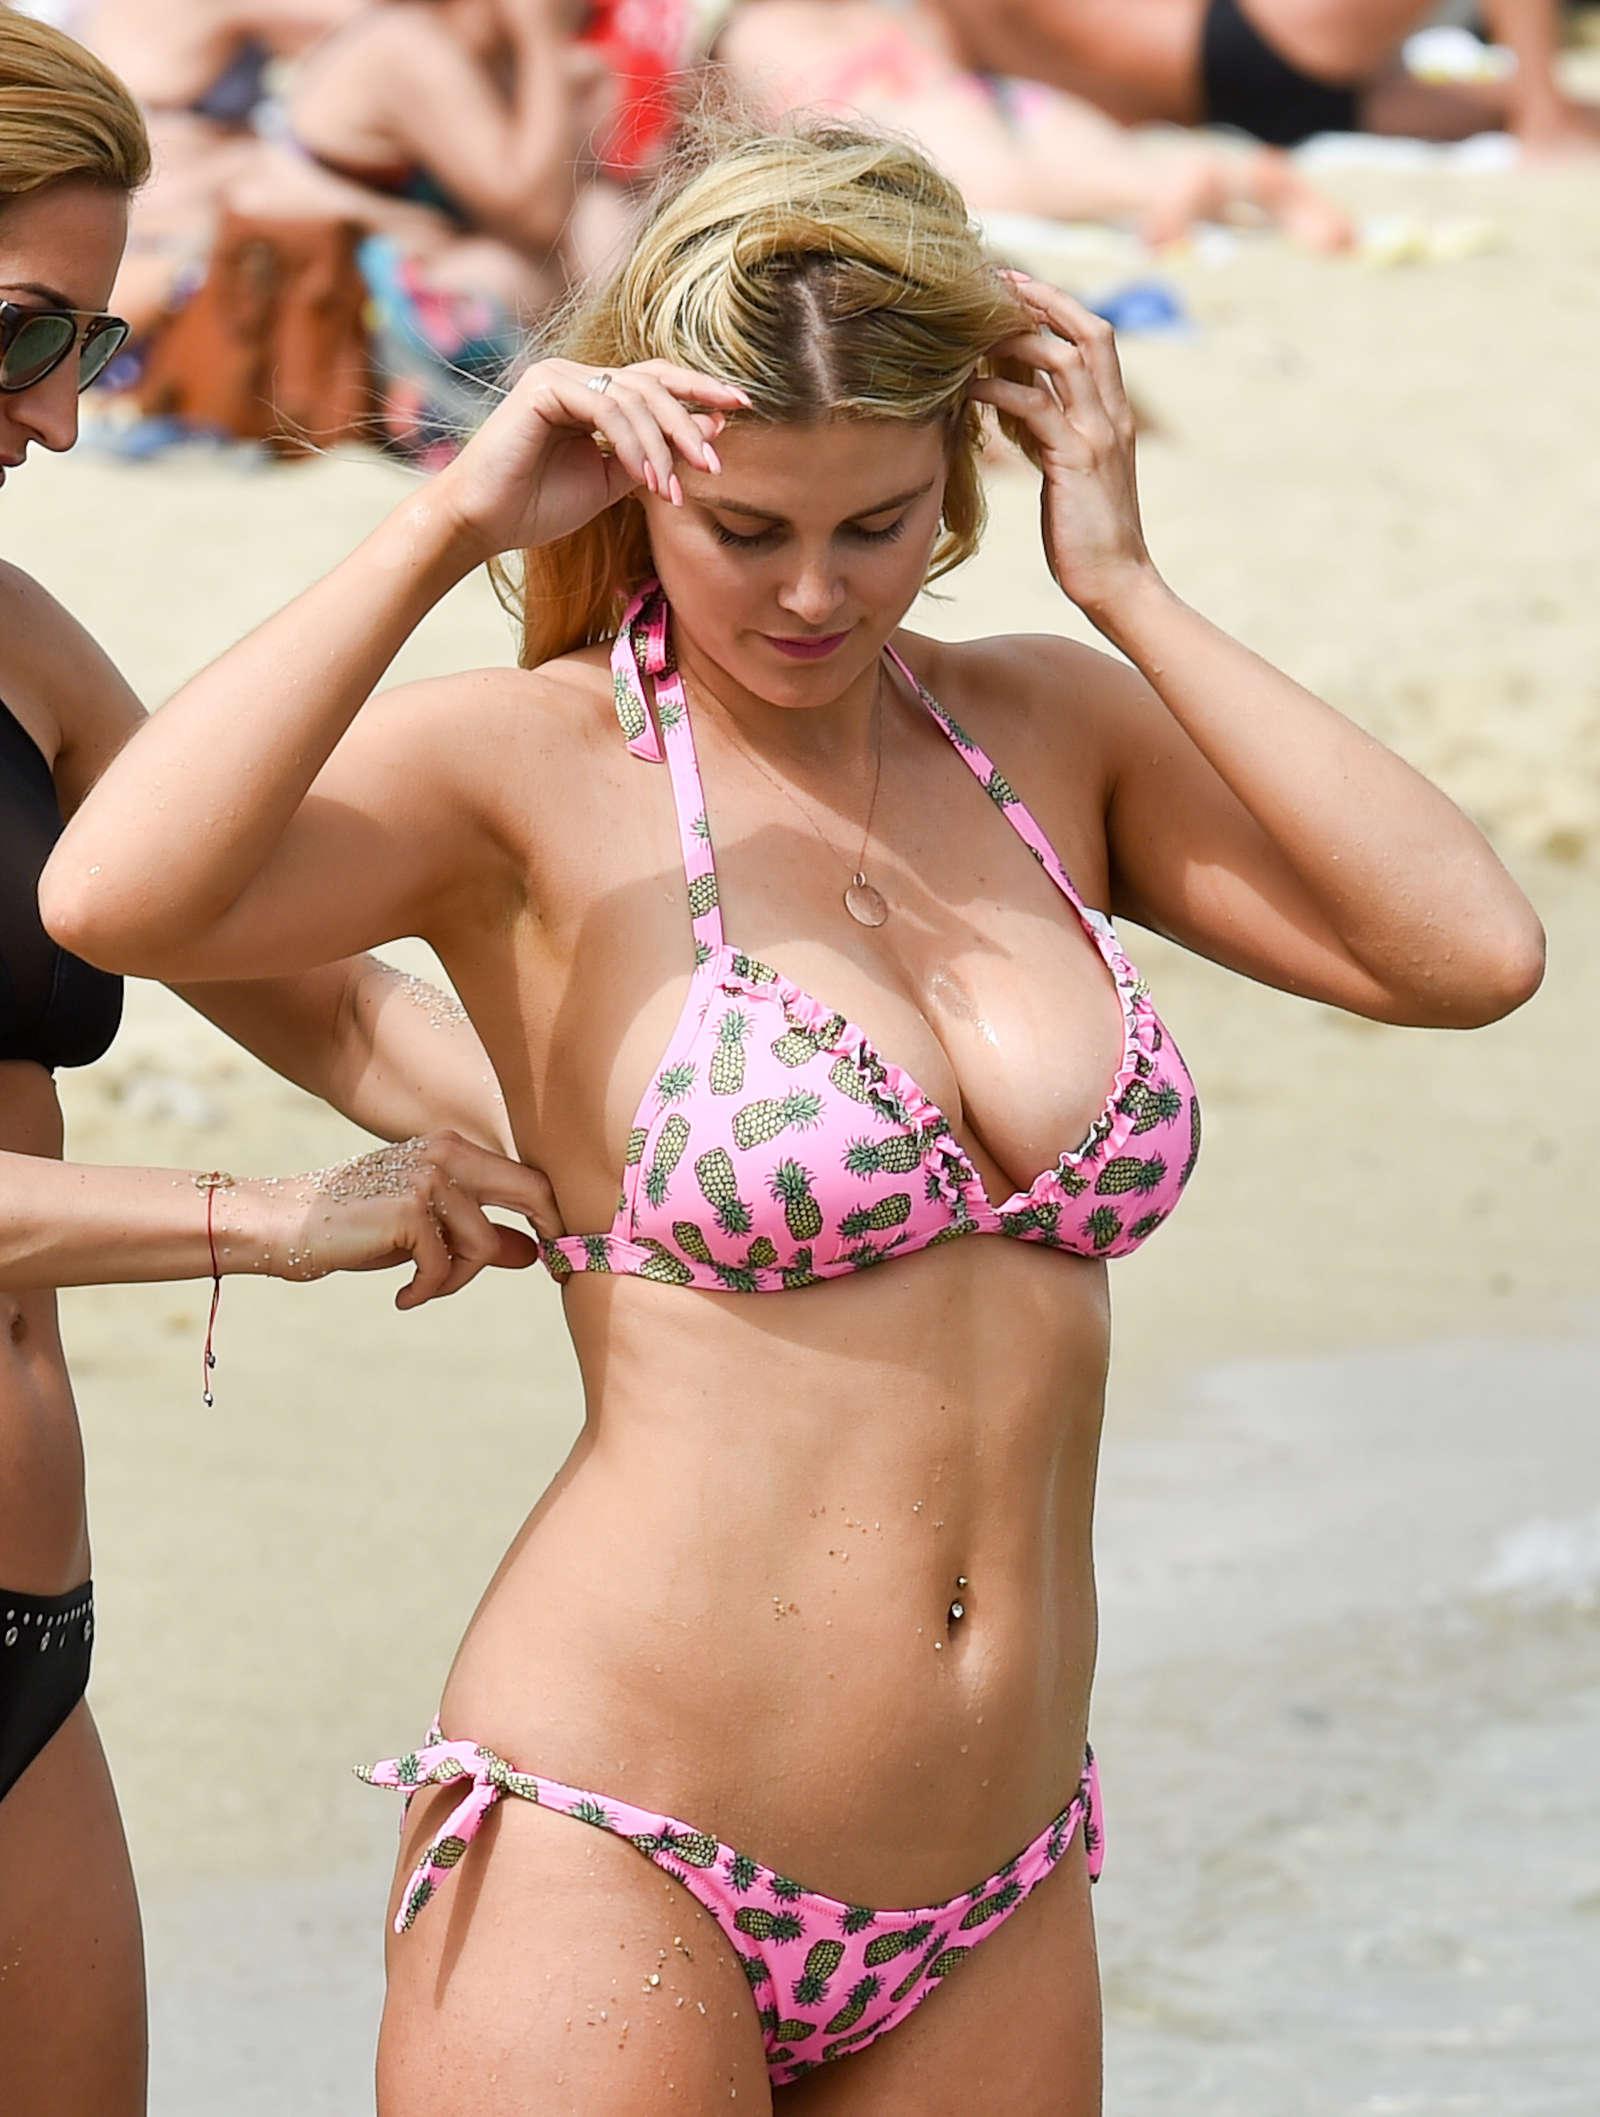 Ashley-James-in-Bikini-2016--41.jpg